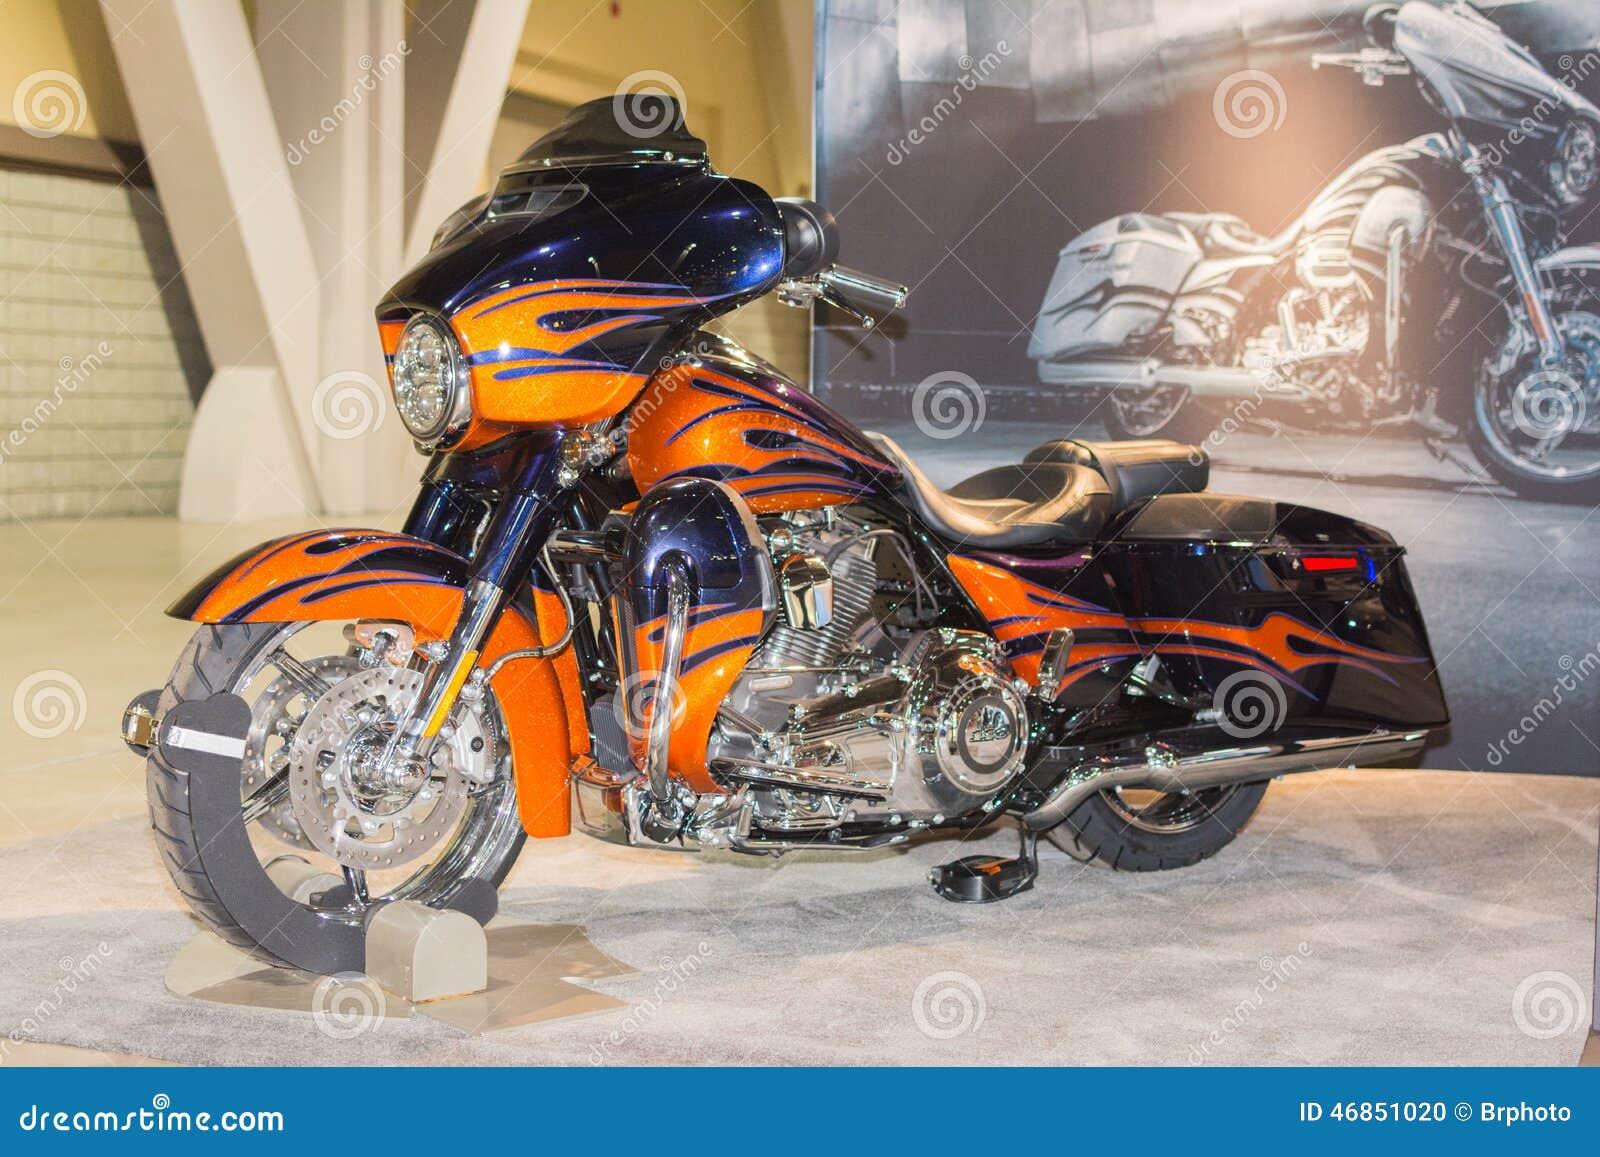 Harley Davidson Cvo Street Glide 2015 Editorial Image